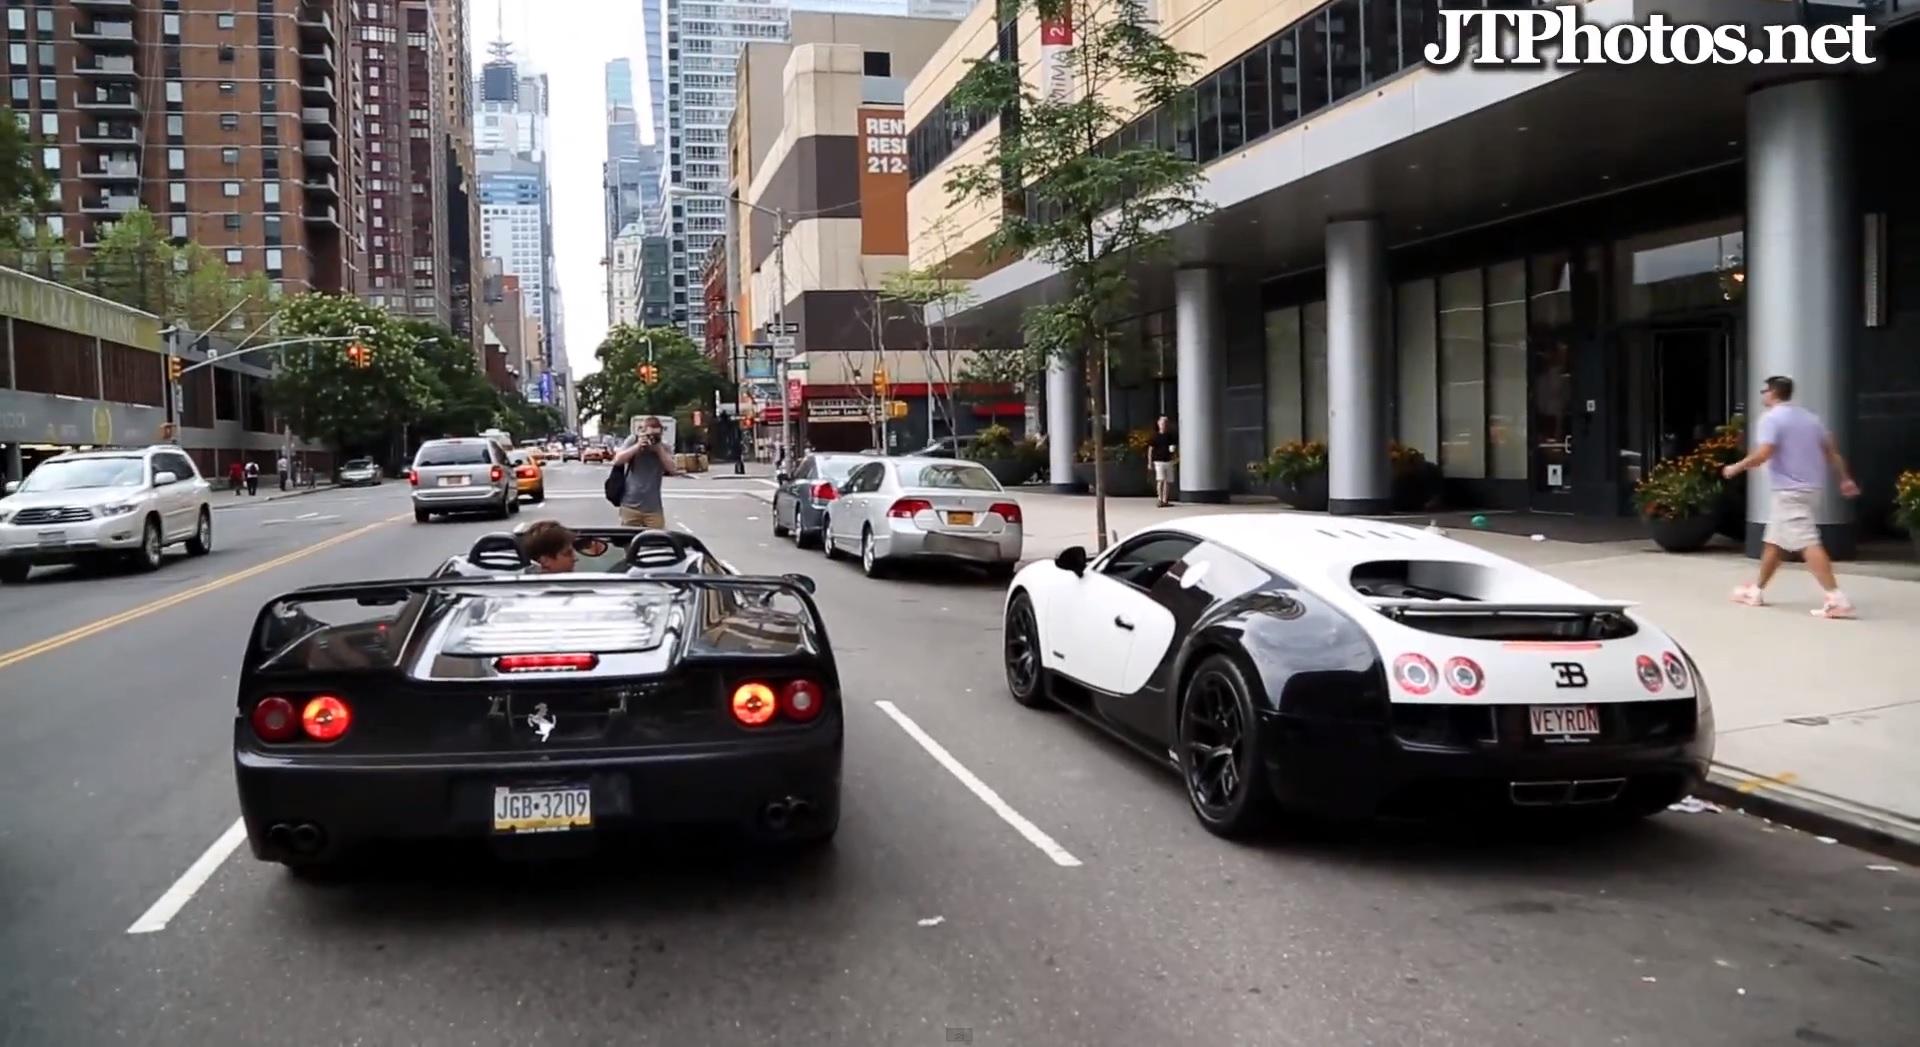 veyron super sport pur blanc ferrari f50 racing through city. Black Bedroom Furniture Sets. Home Design Ideas